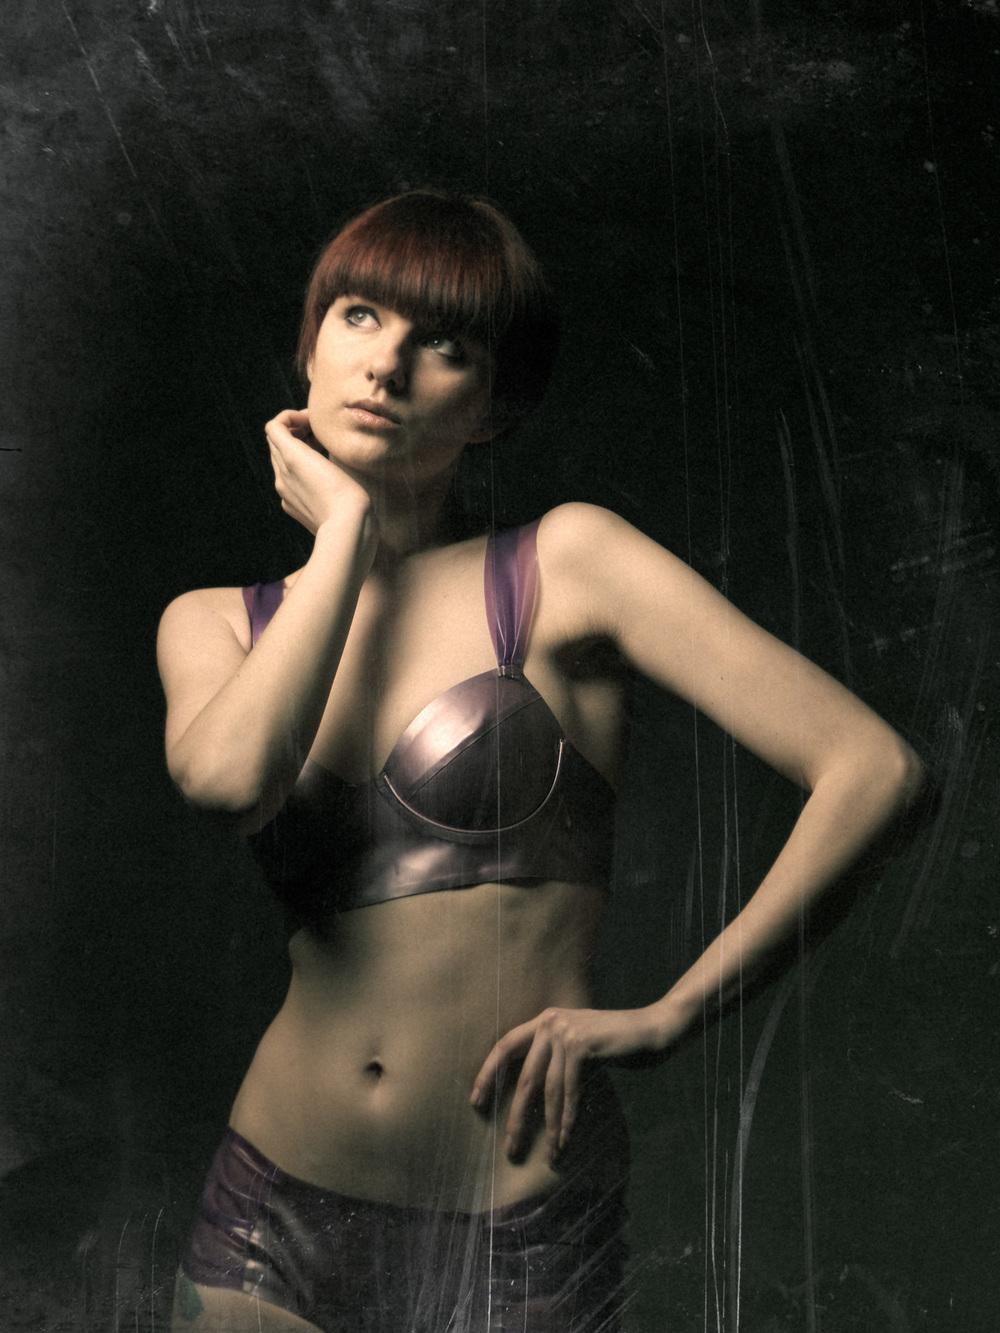 Bernard_Panier-FashionLike-016.jpg